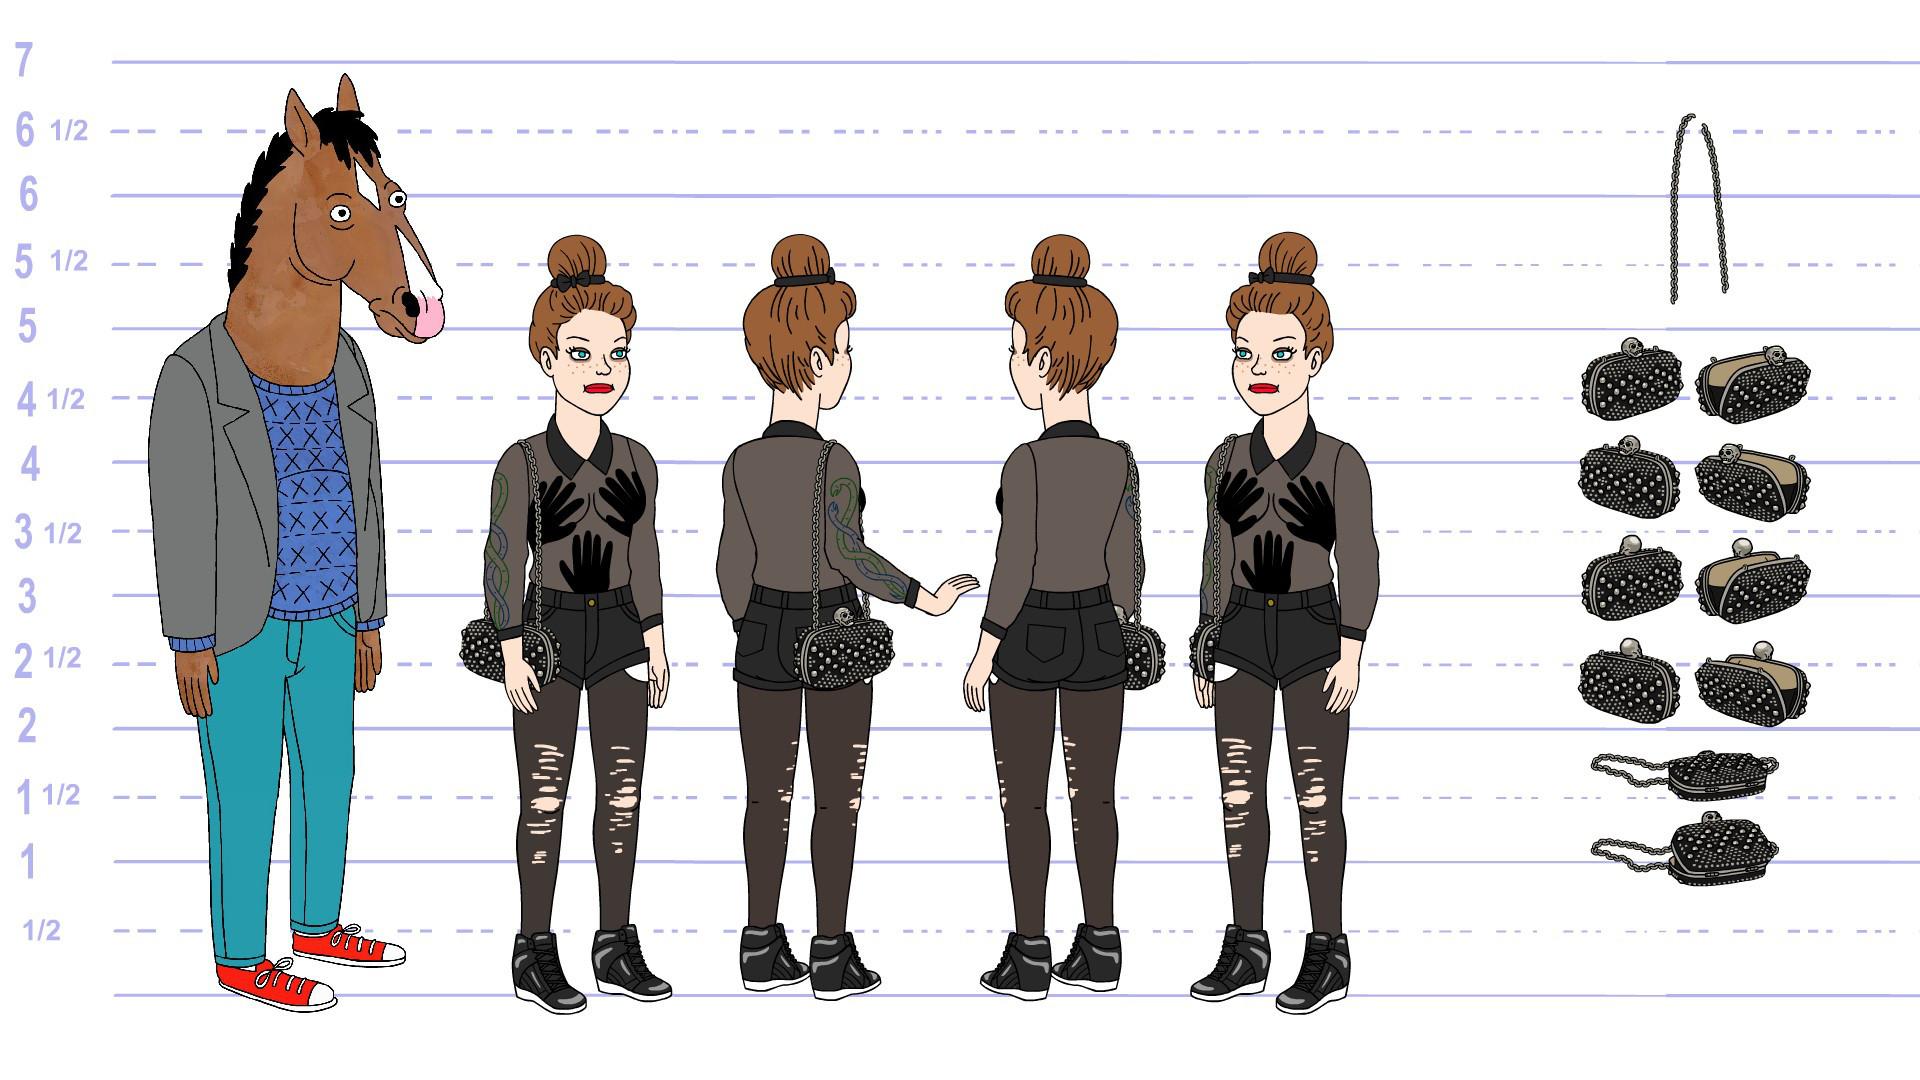 Sarah_Lynn_funeral_outfit_model_sheet.jpg